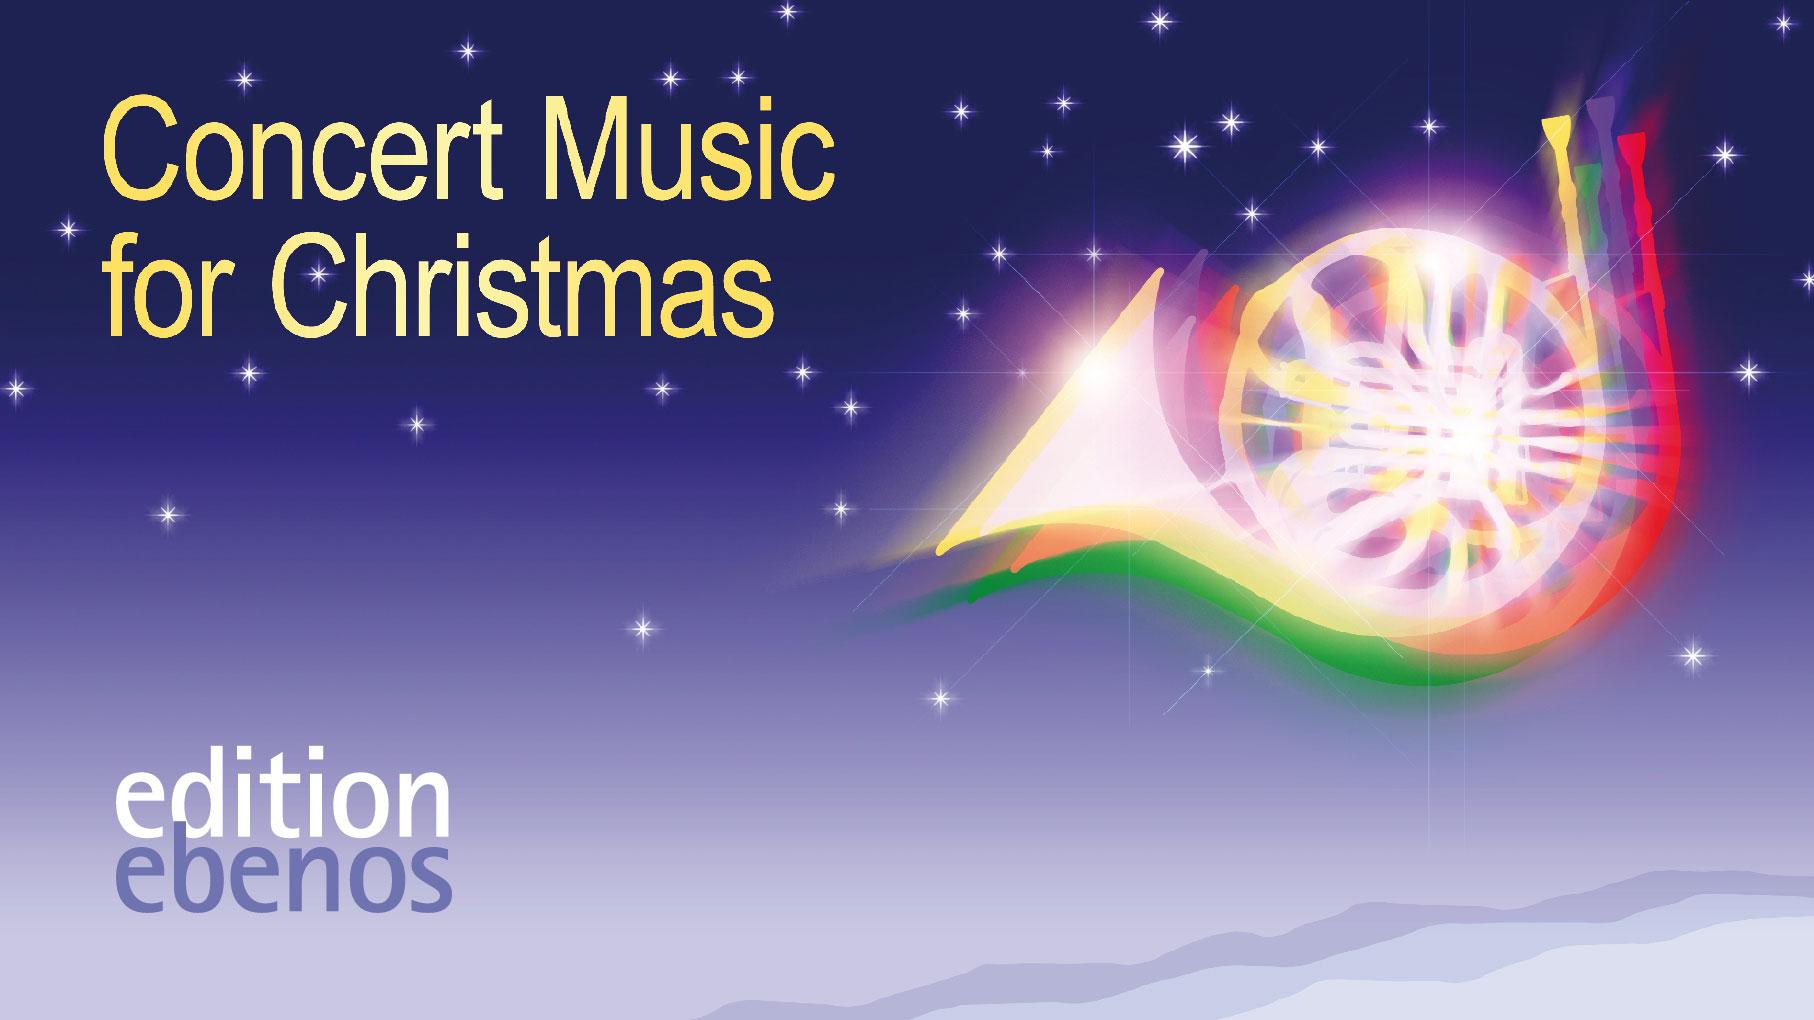 Cover Design for Christmas: Die Augen hören schon Musik